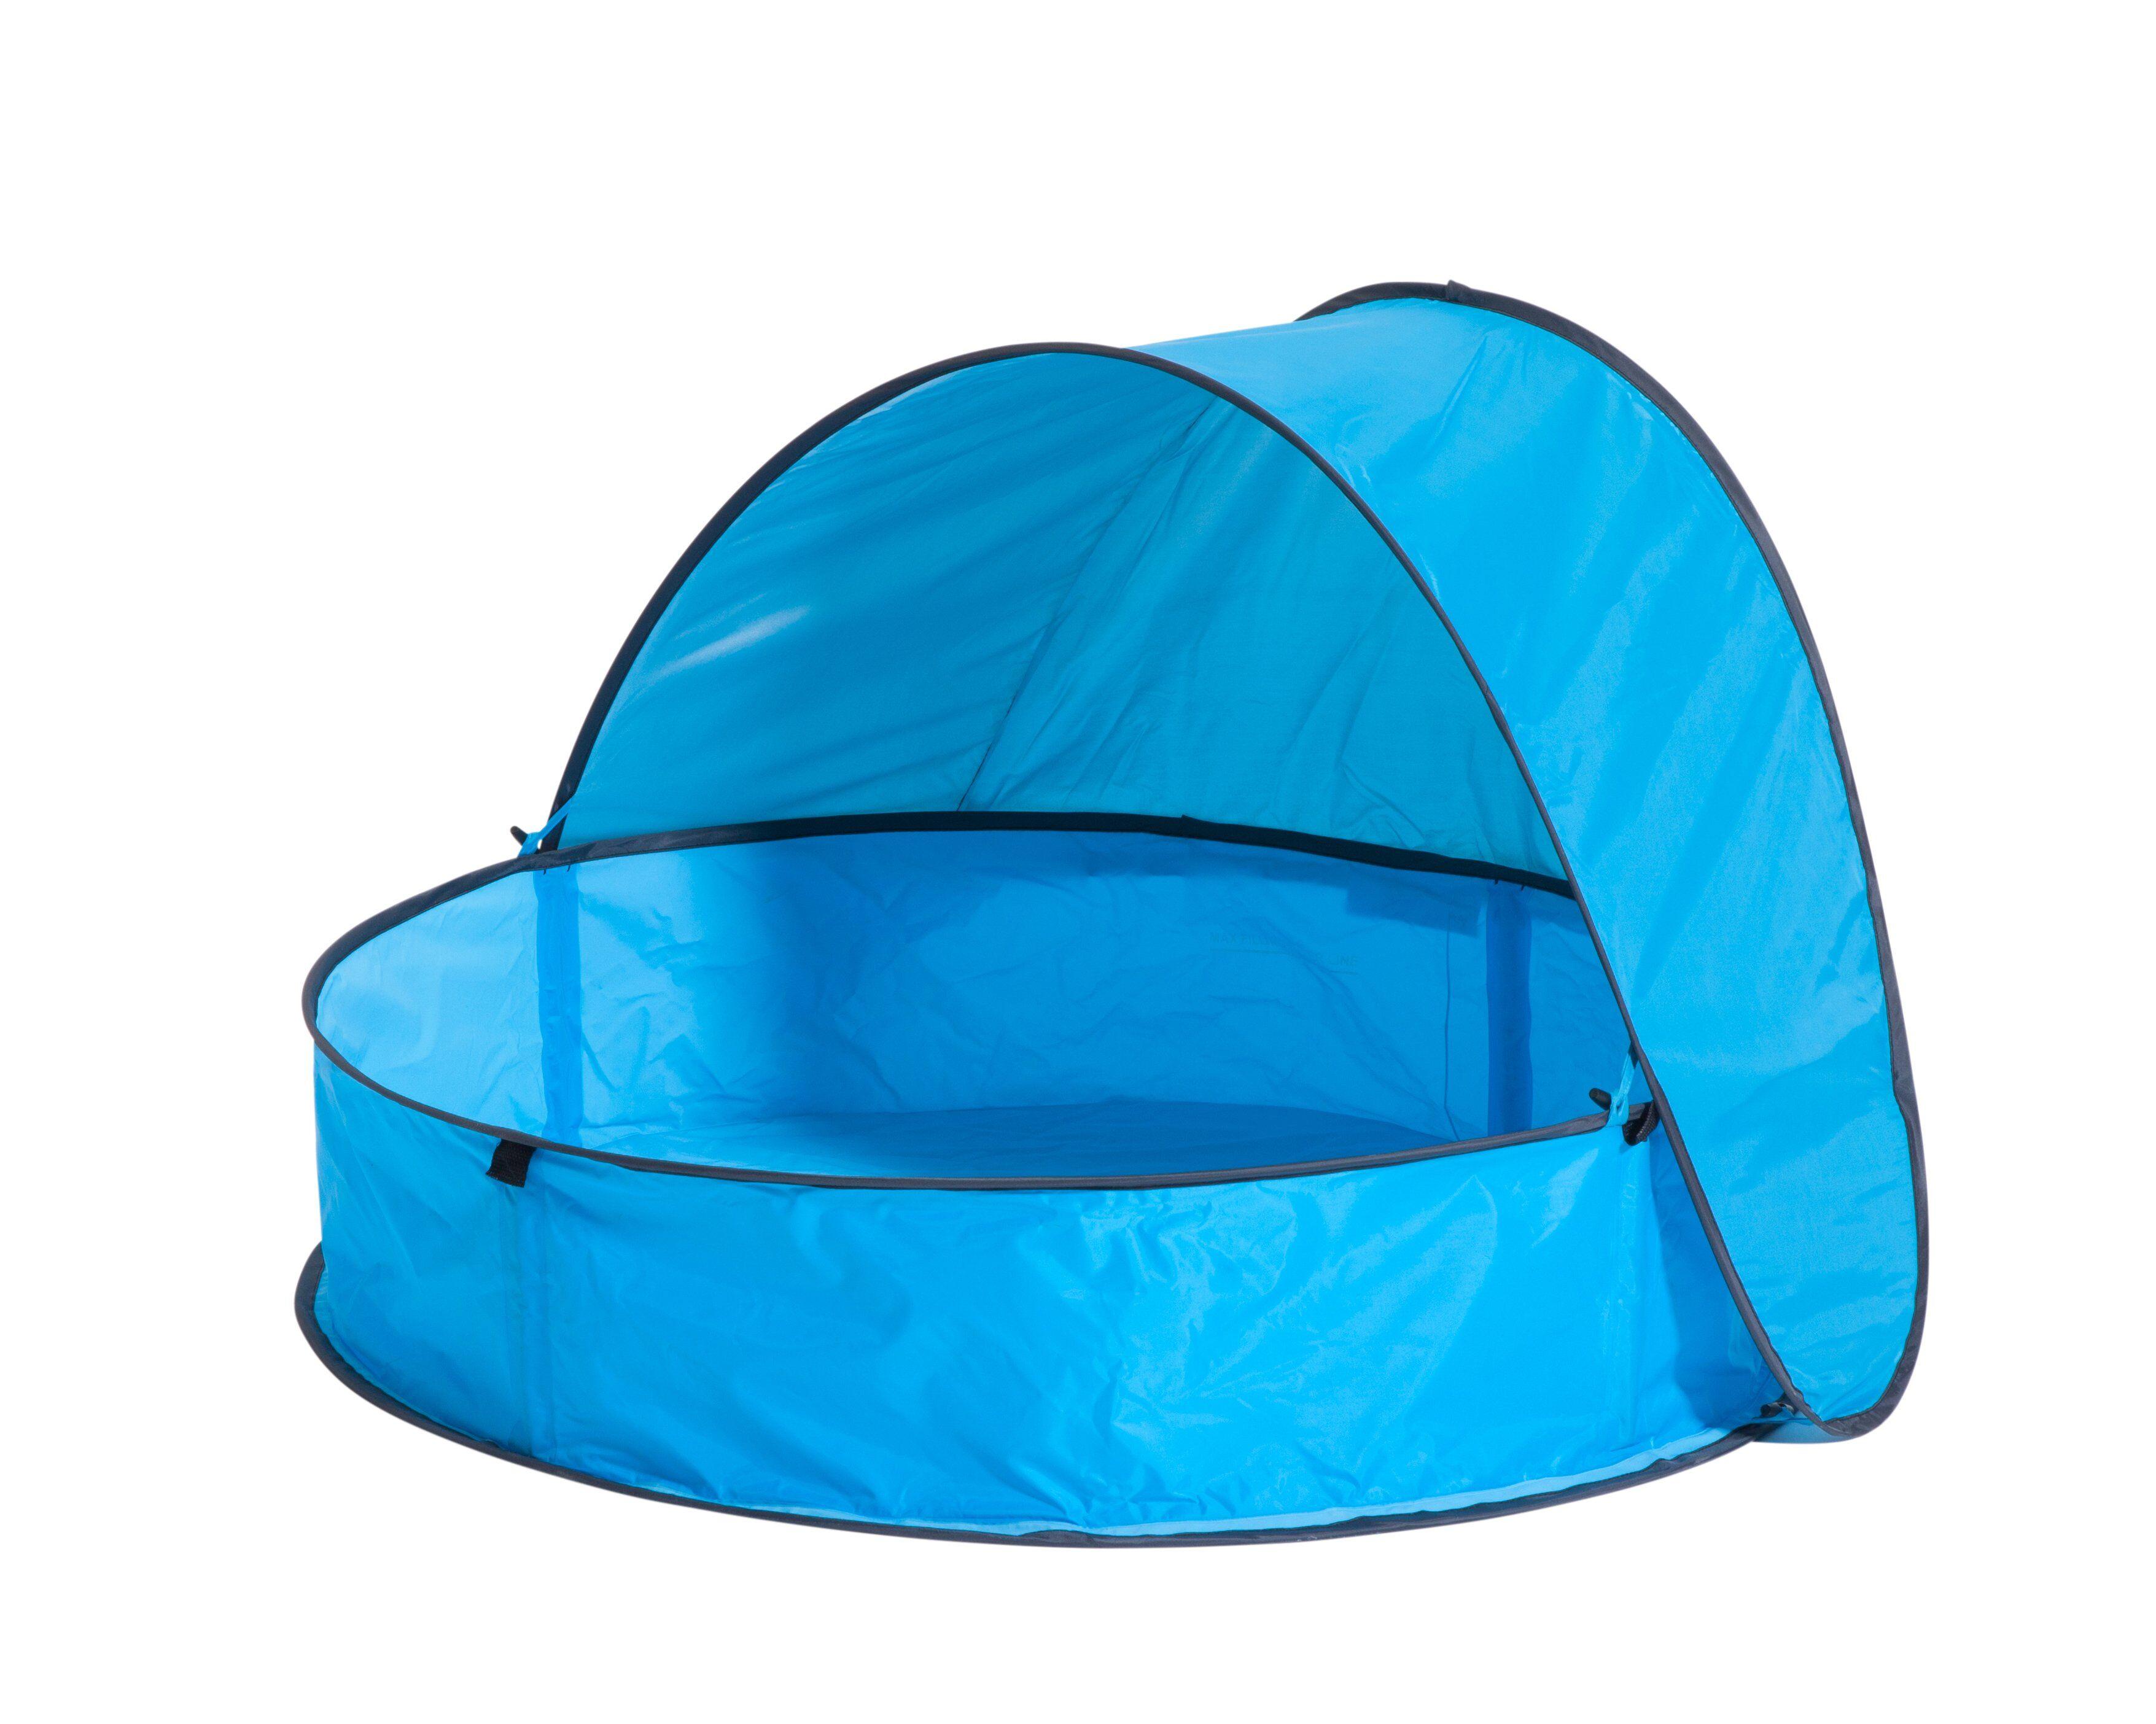 Deryan Smart Pop-up Pool with UV Sunscreen